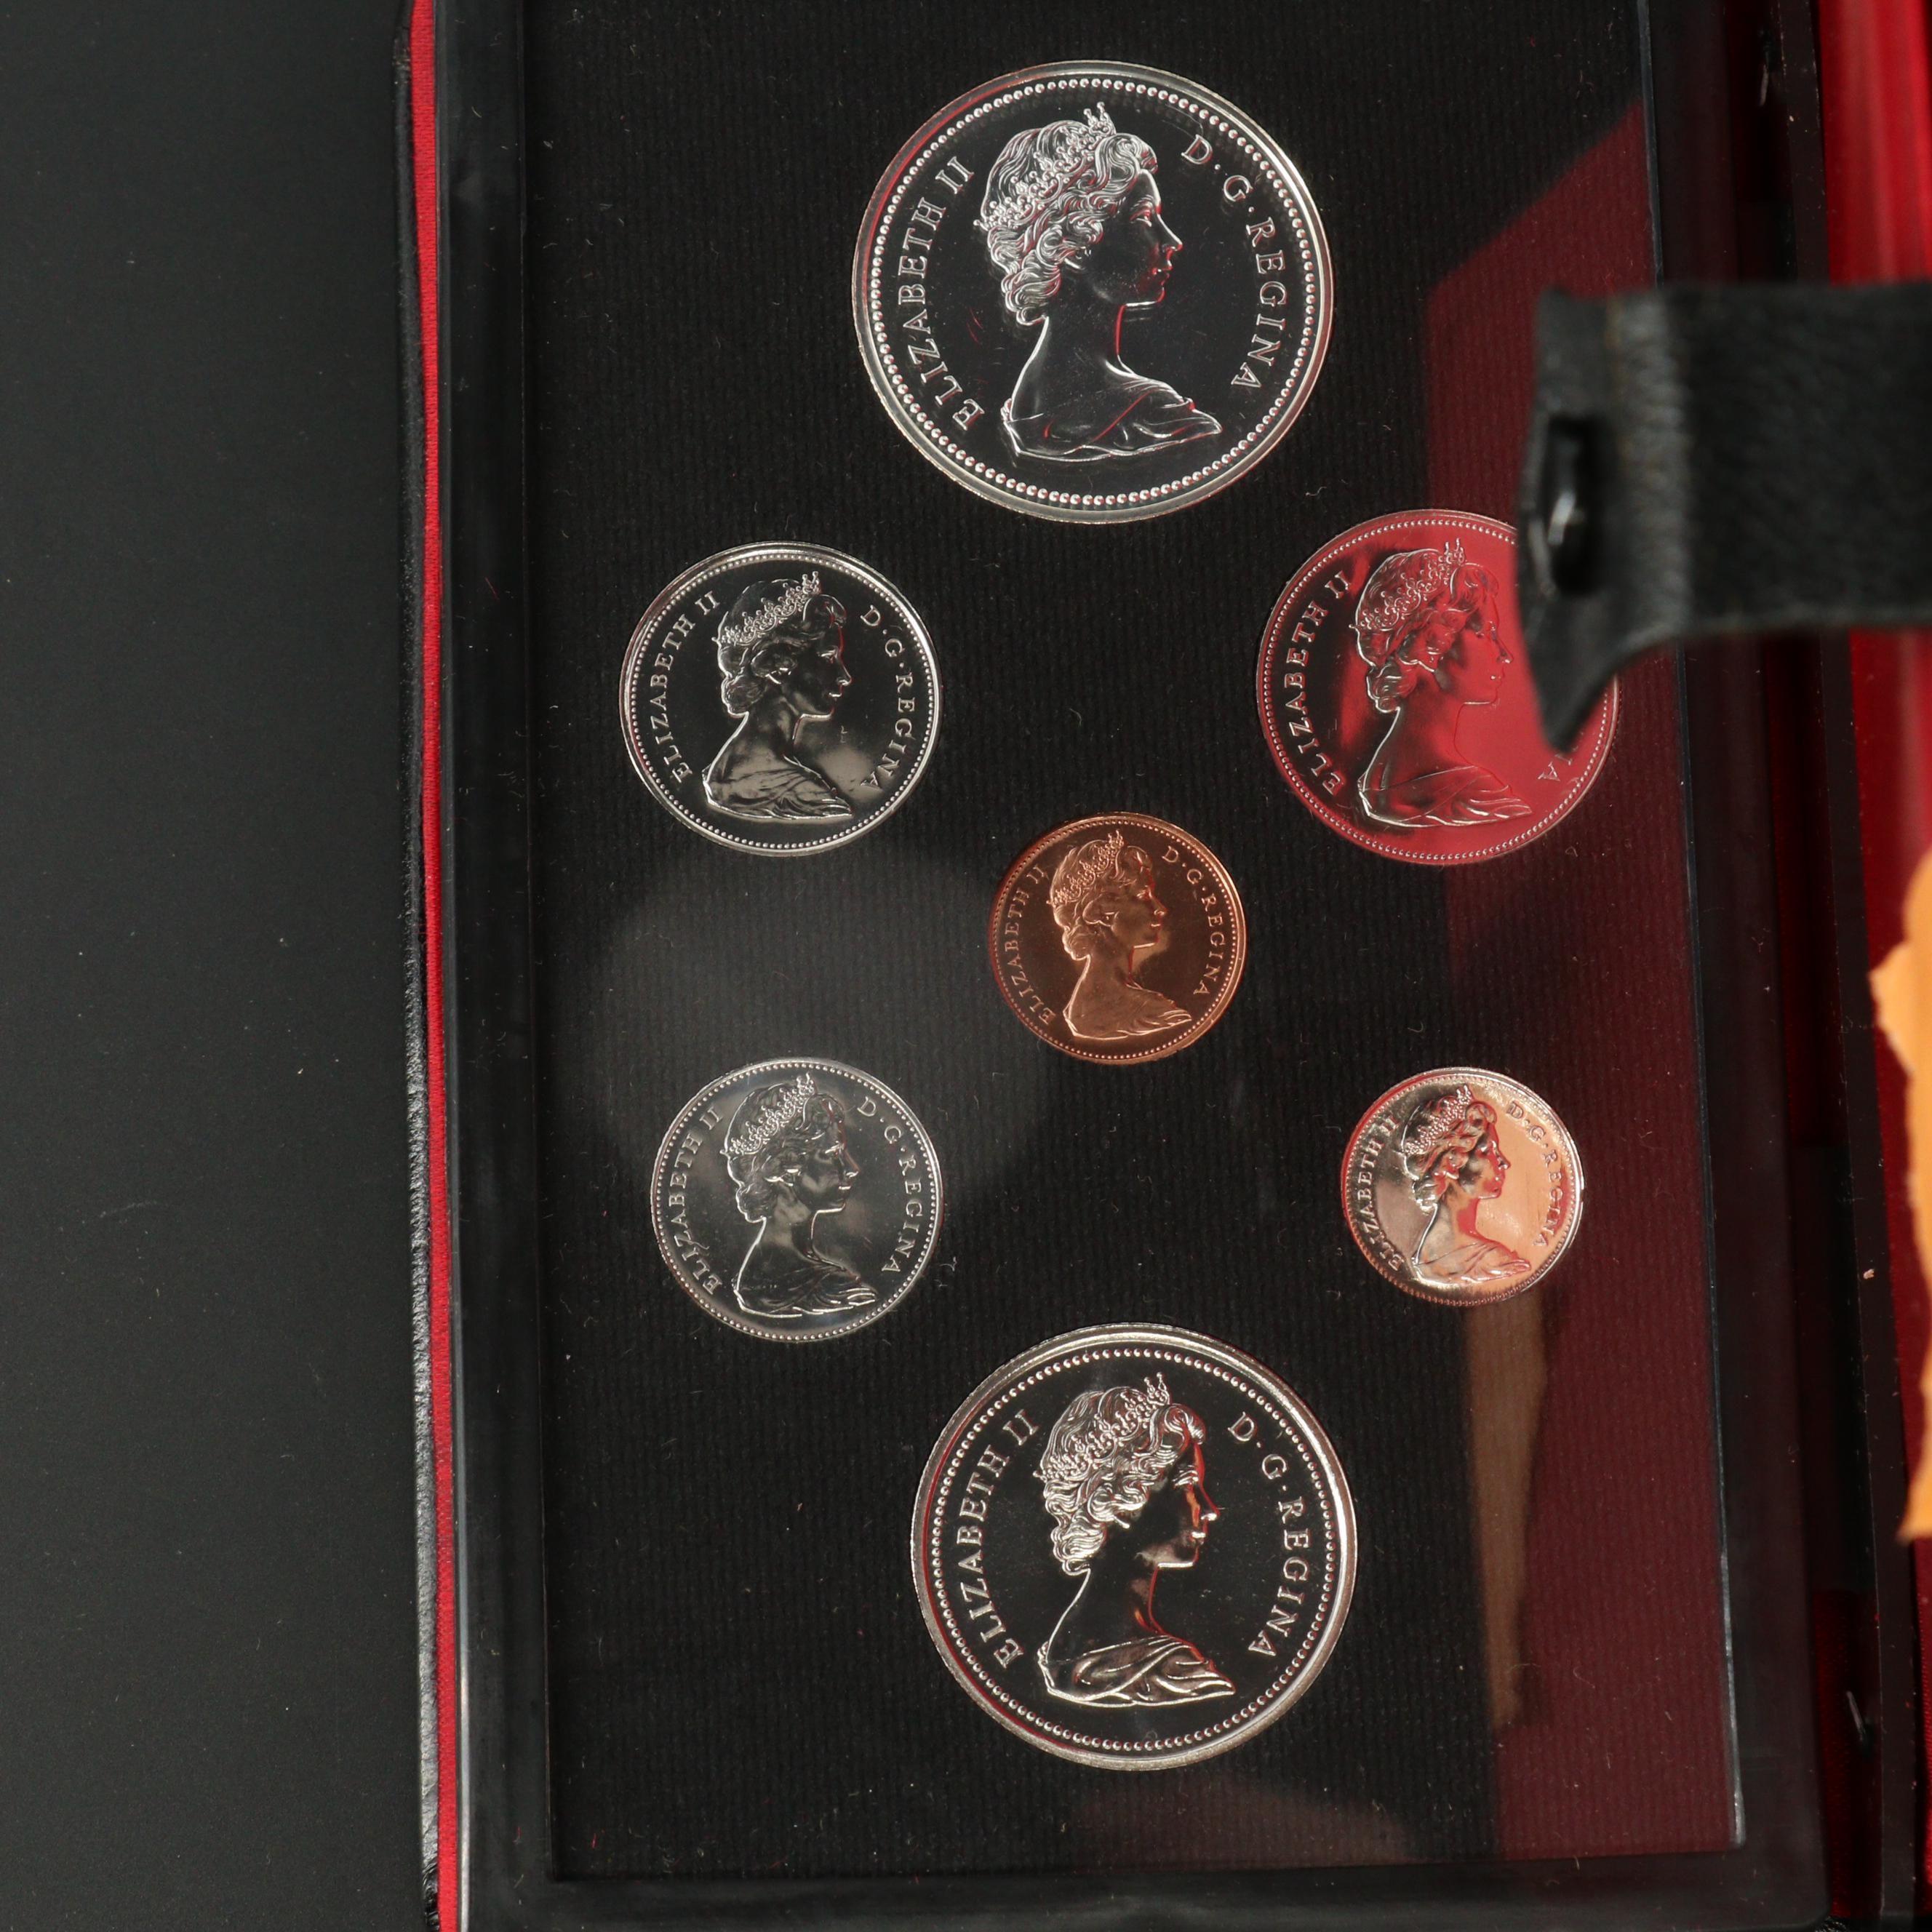 1974 Royal Canadian Mint Proof Set